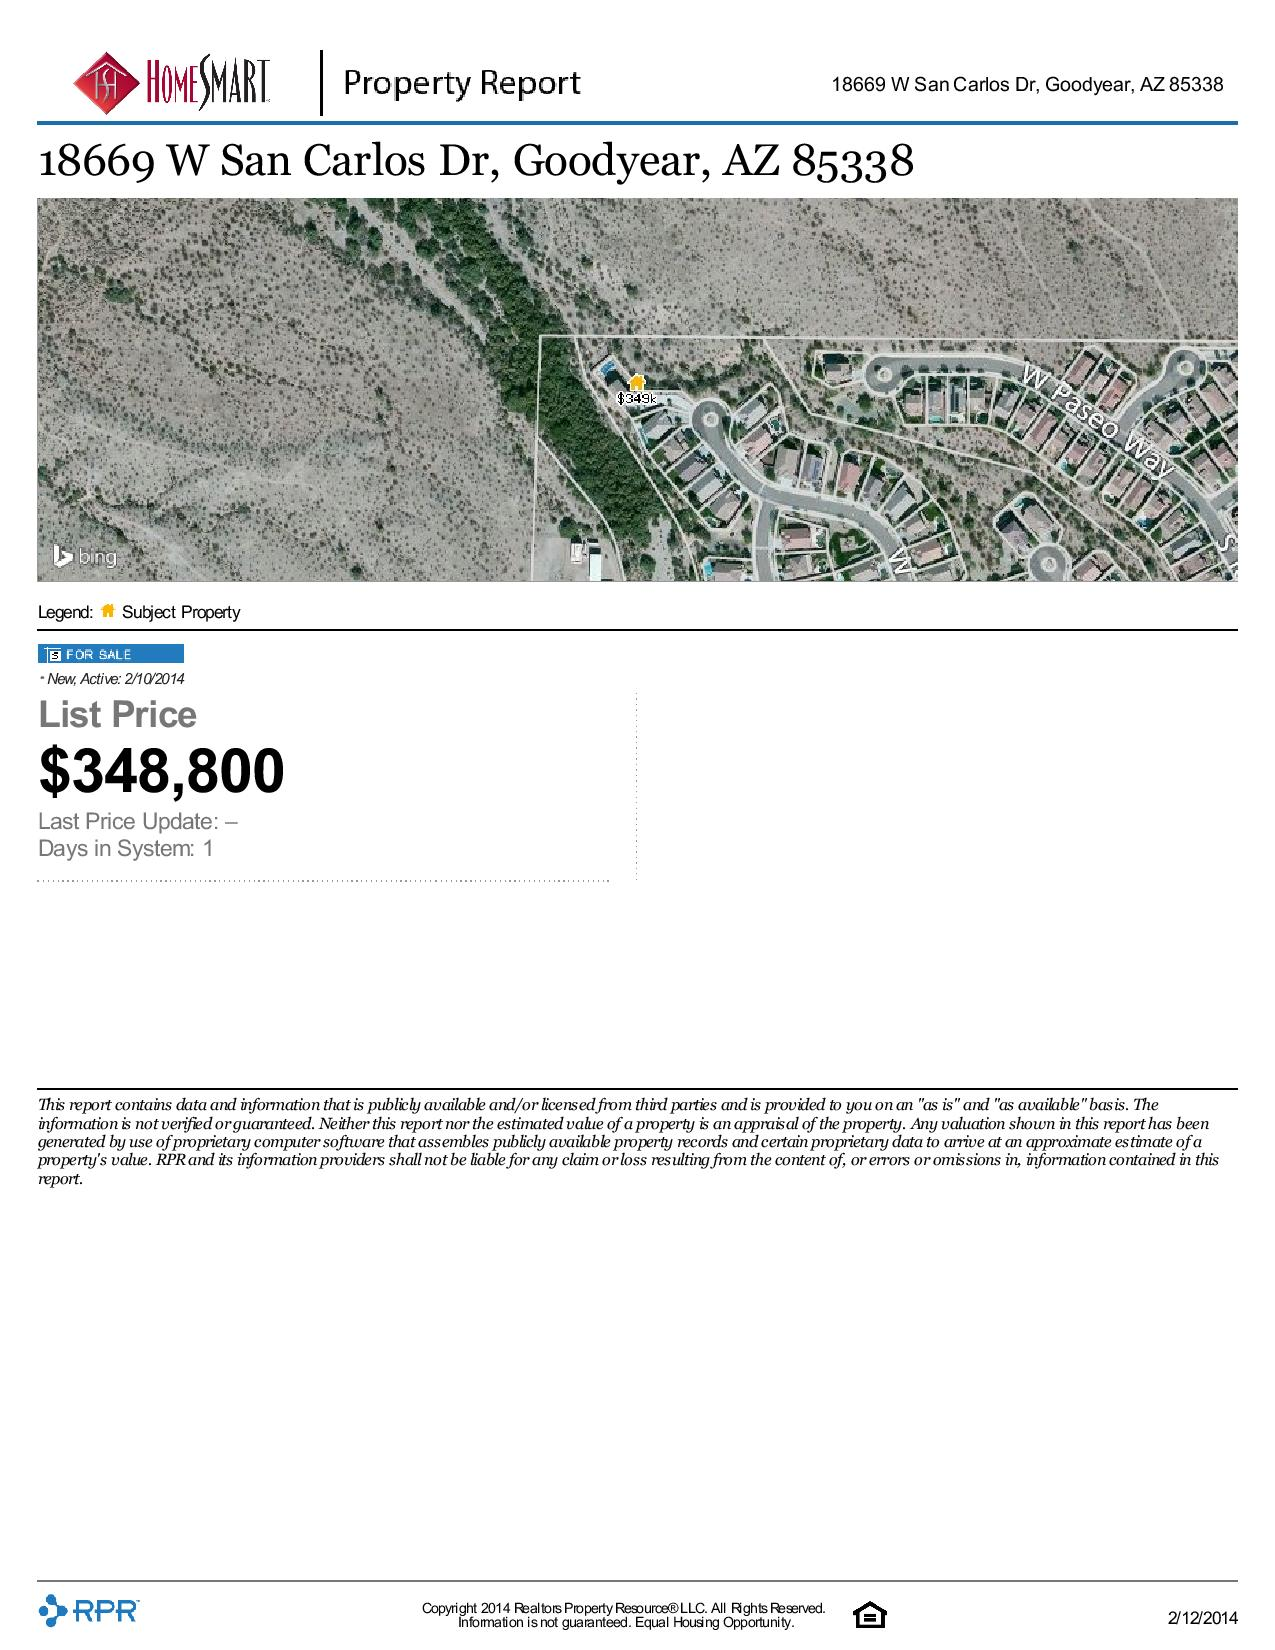 18669-W-San-Carlos-Dr-Goodyear-AZ-85338-page-002